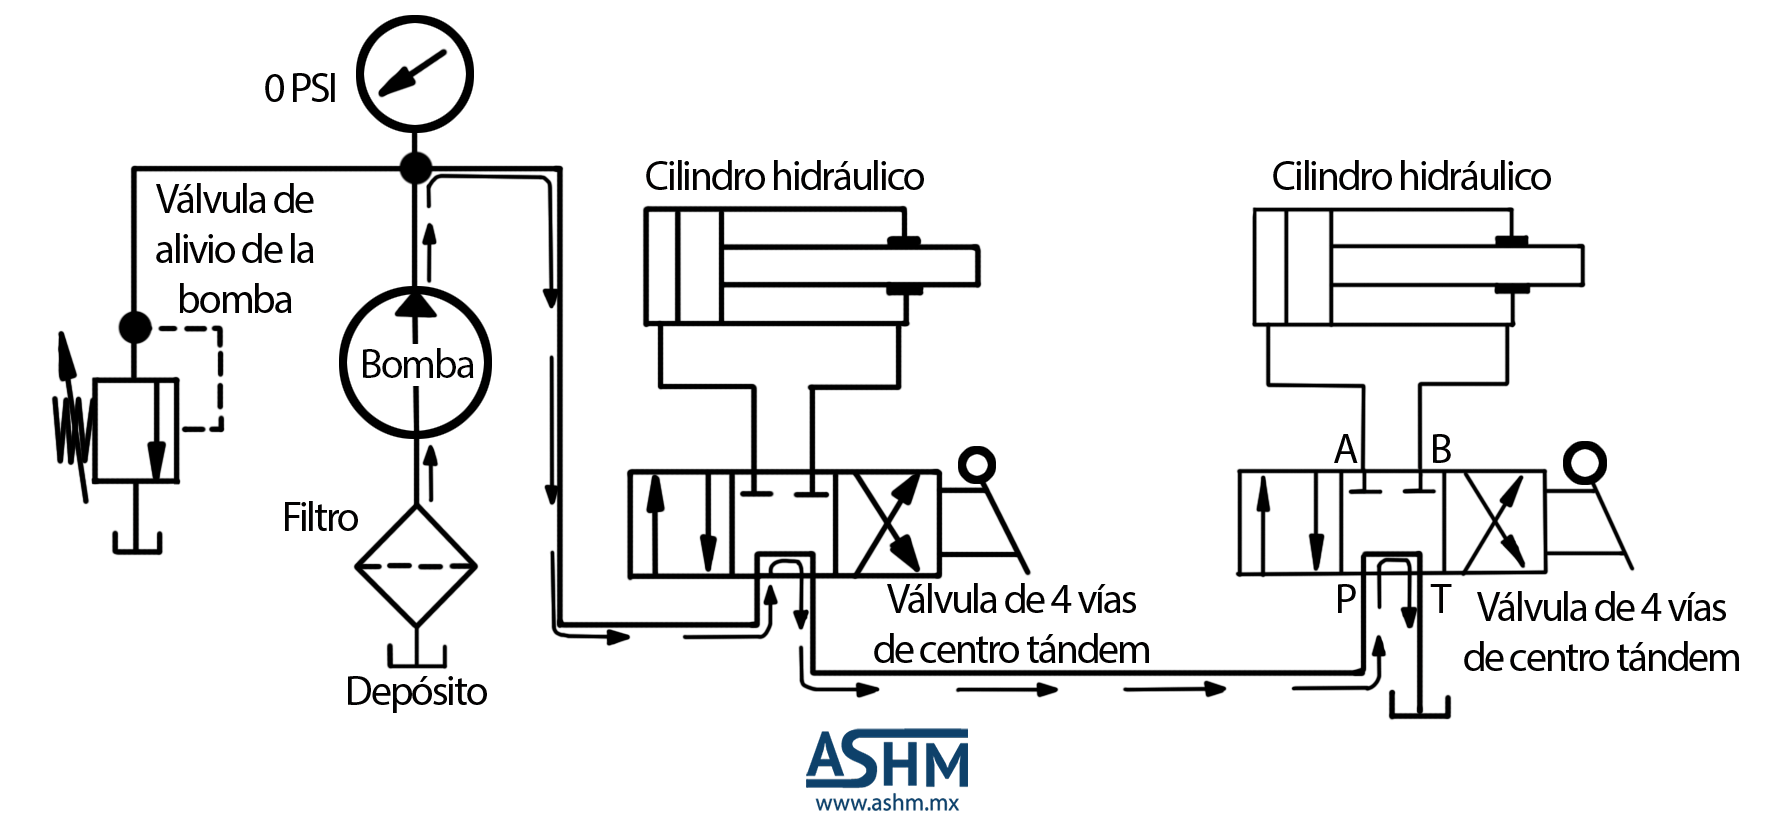 Neumatica Simbologia